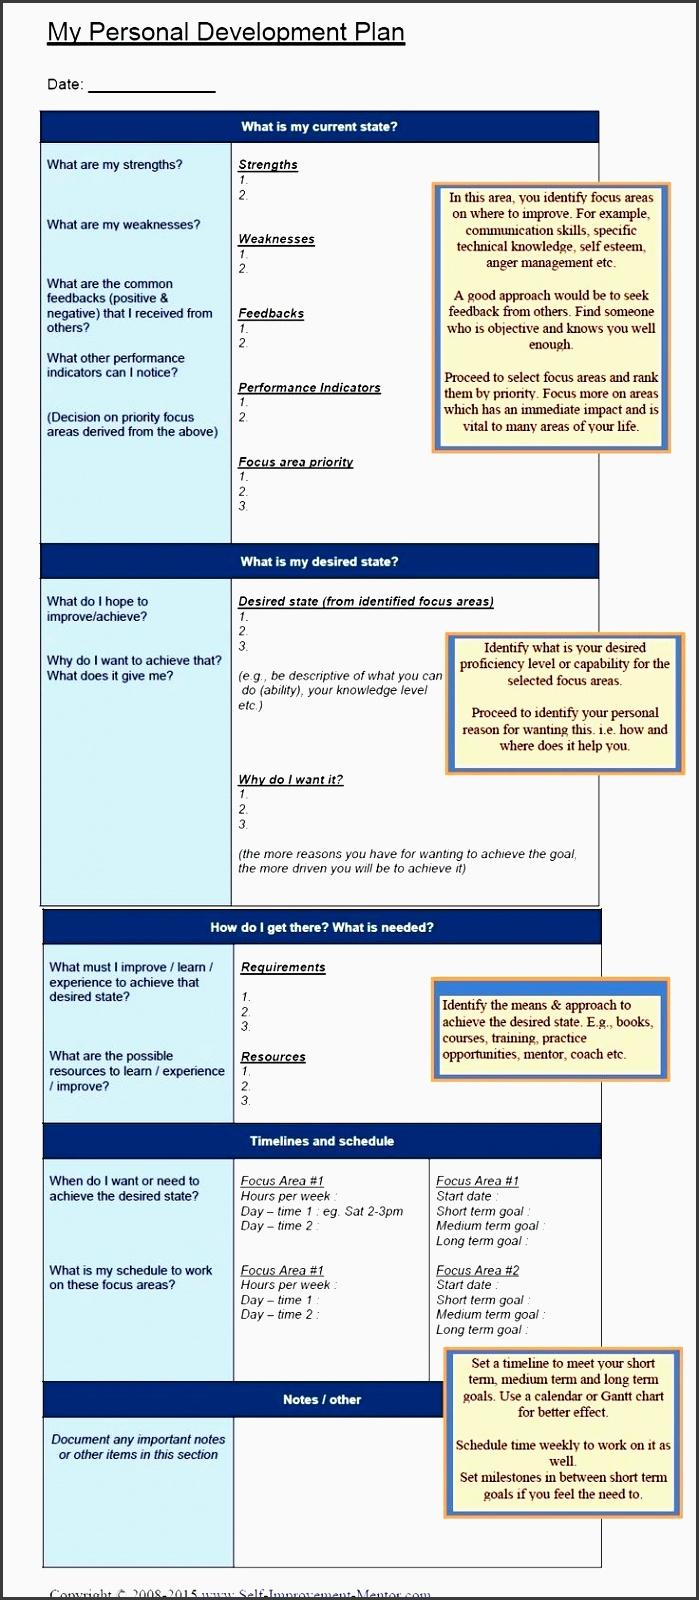 Life Plan Templates Velocitycartk - Life planner template